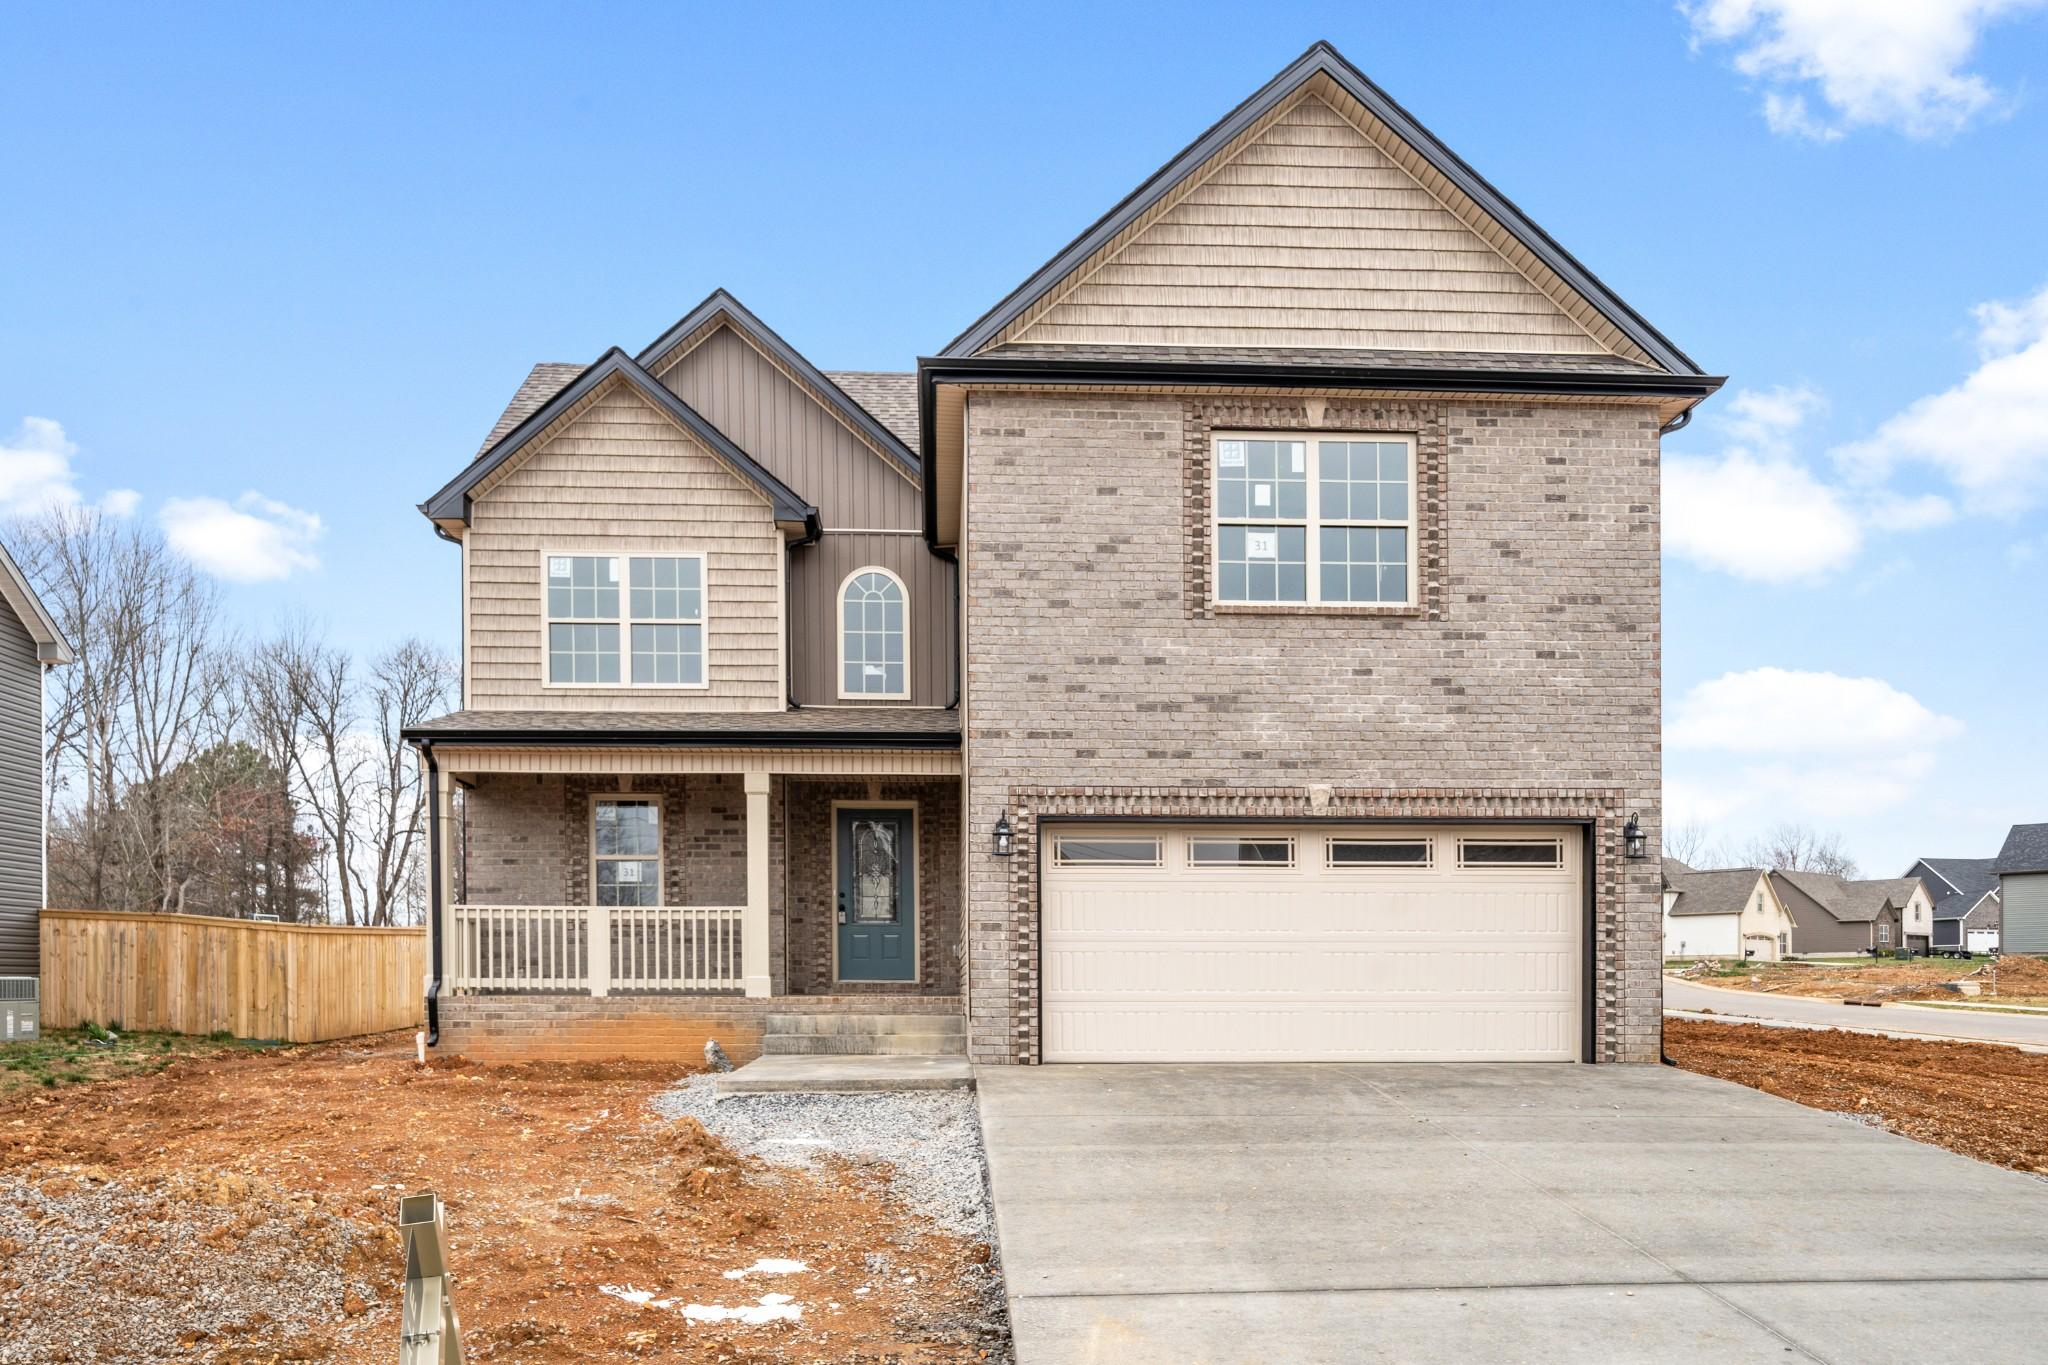 358 Rye Drive, Clarksville, TN 37043 - Clarksville, TN real estate listing